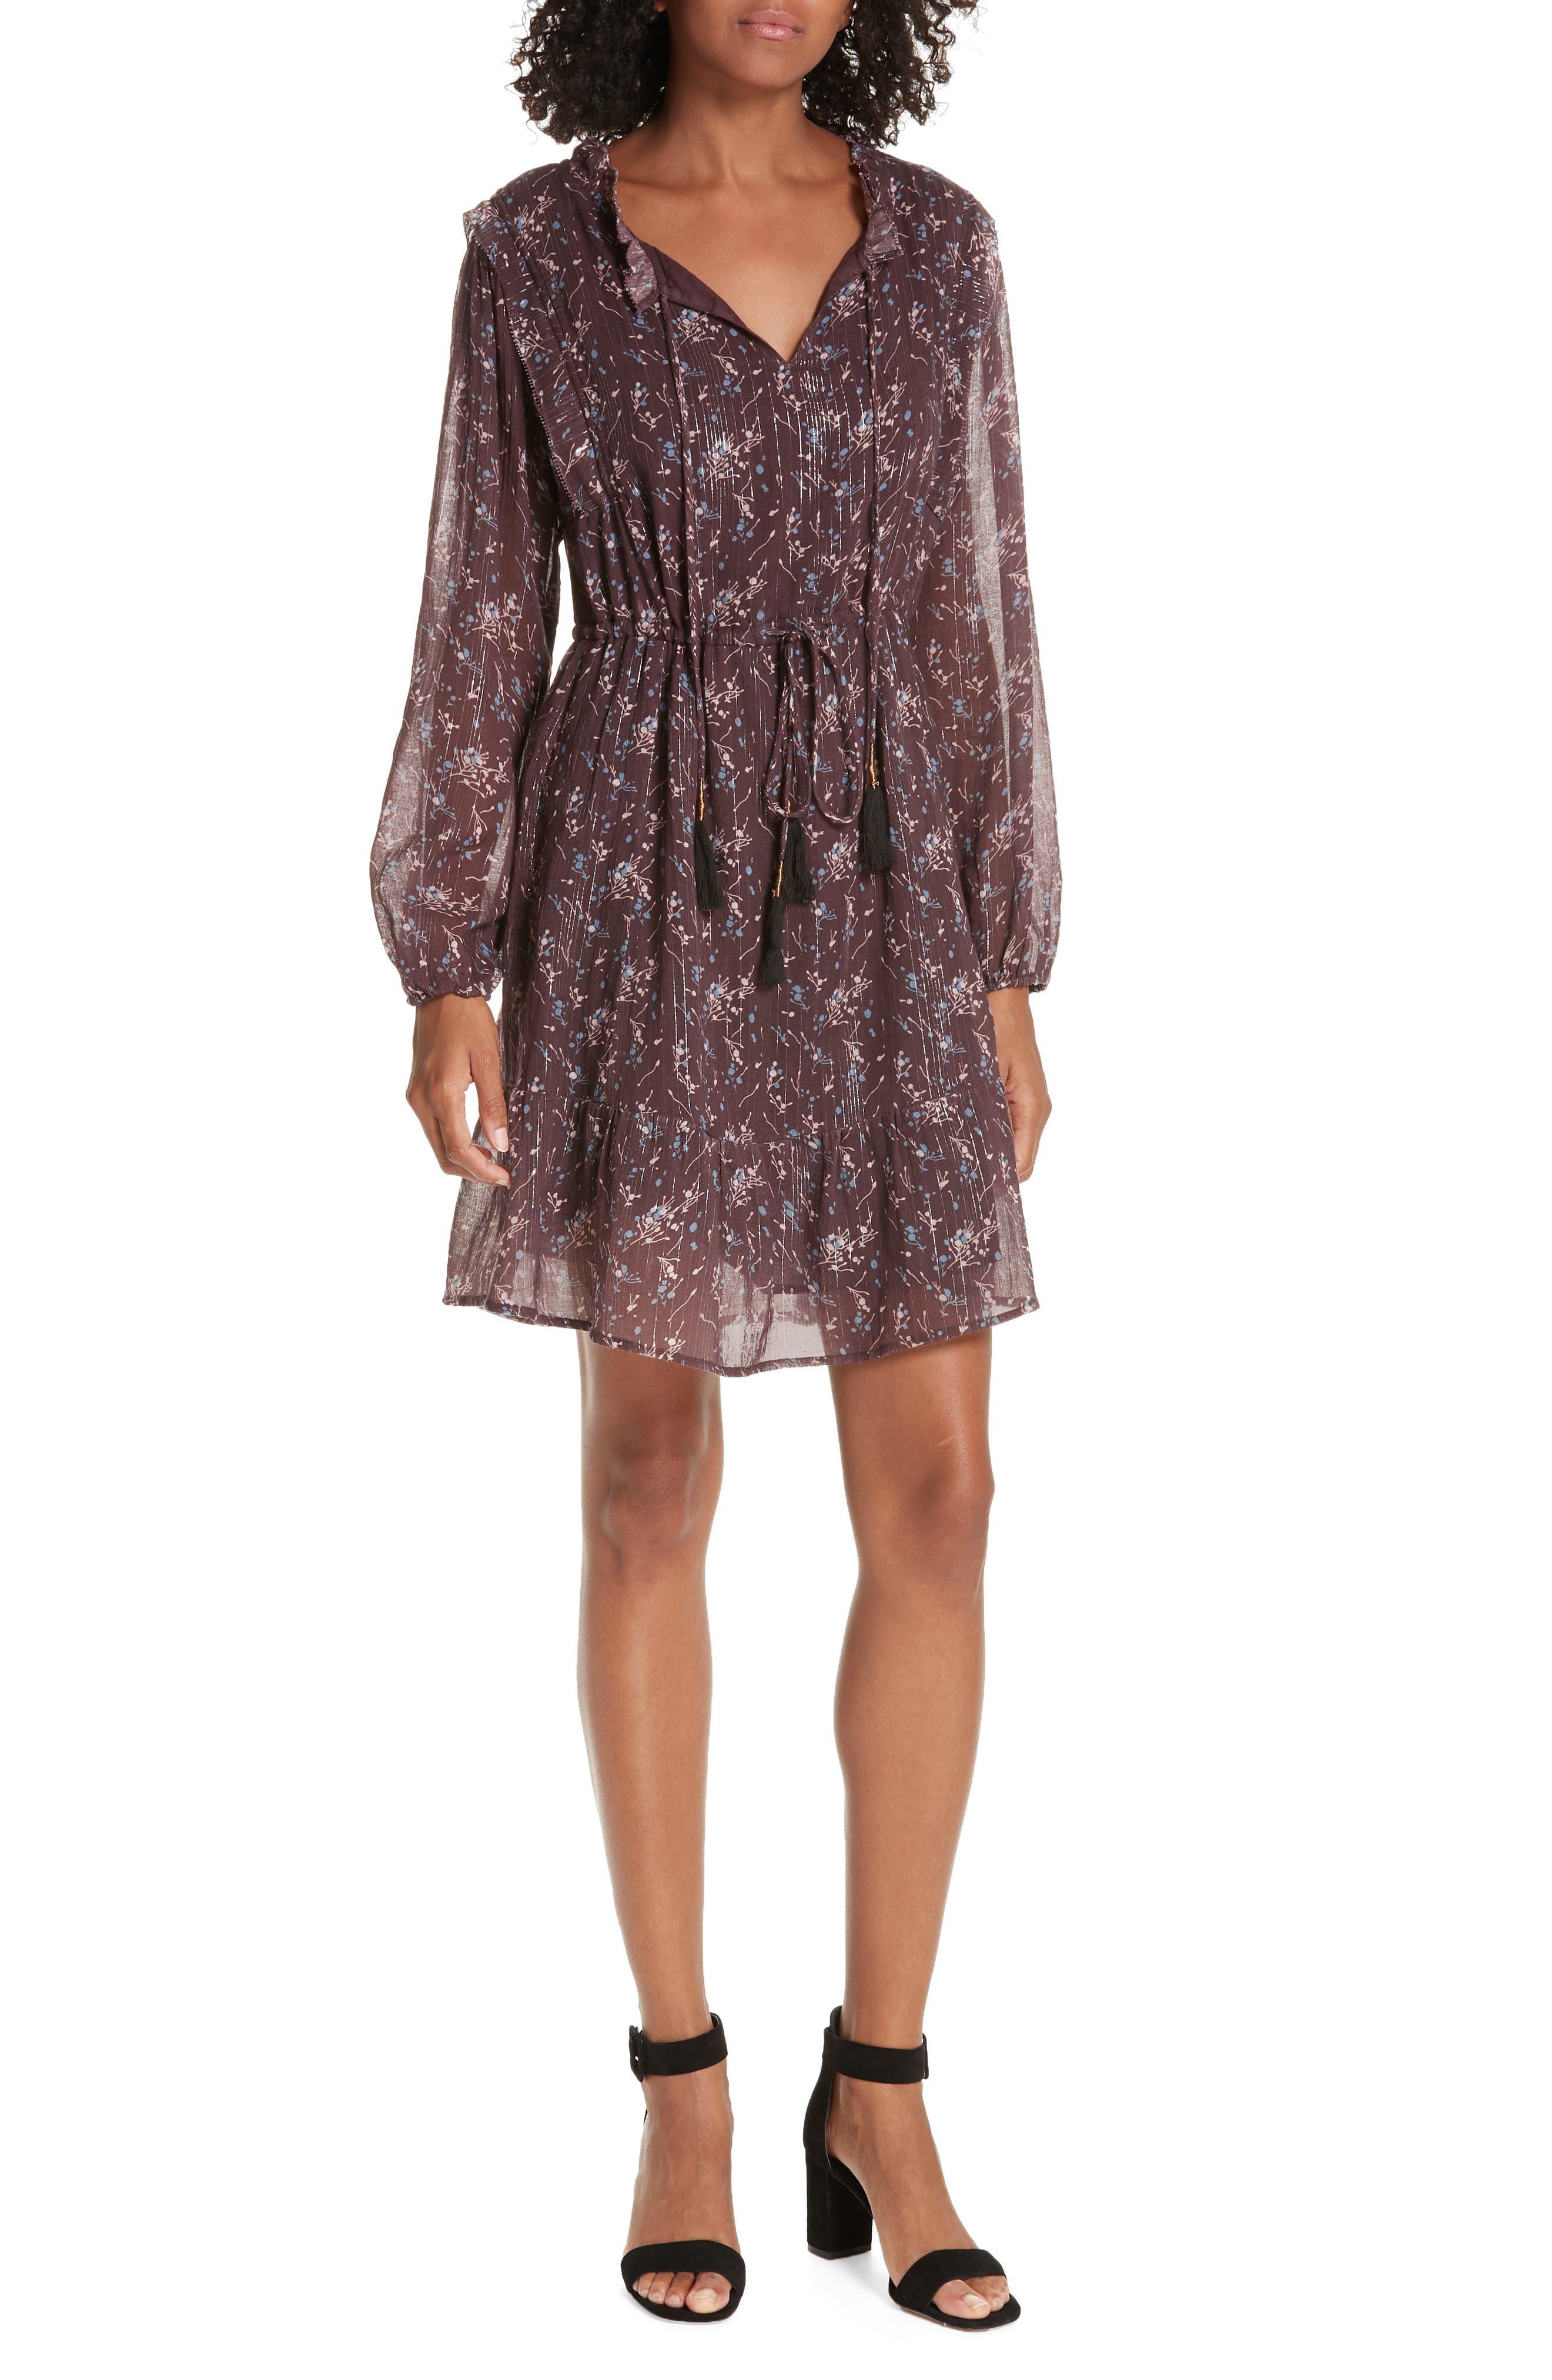 Ruffled Drawstring Waist Dress,                             Main thumbnail 1, color,                             BROWN PLUM BLOSSOM